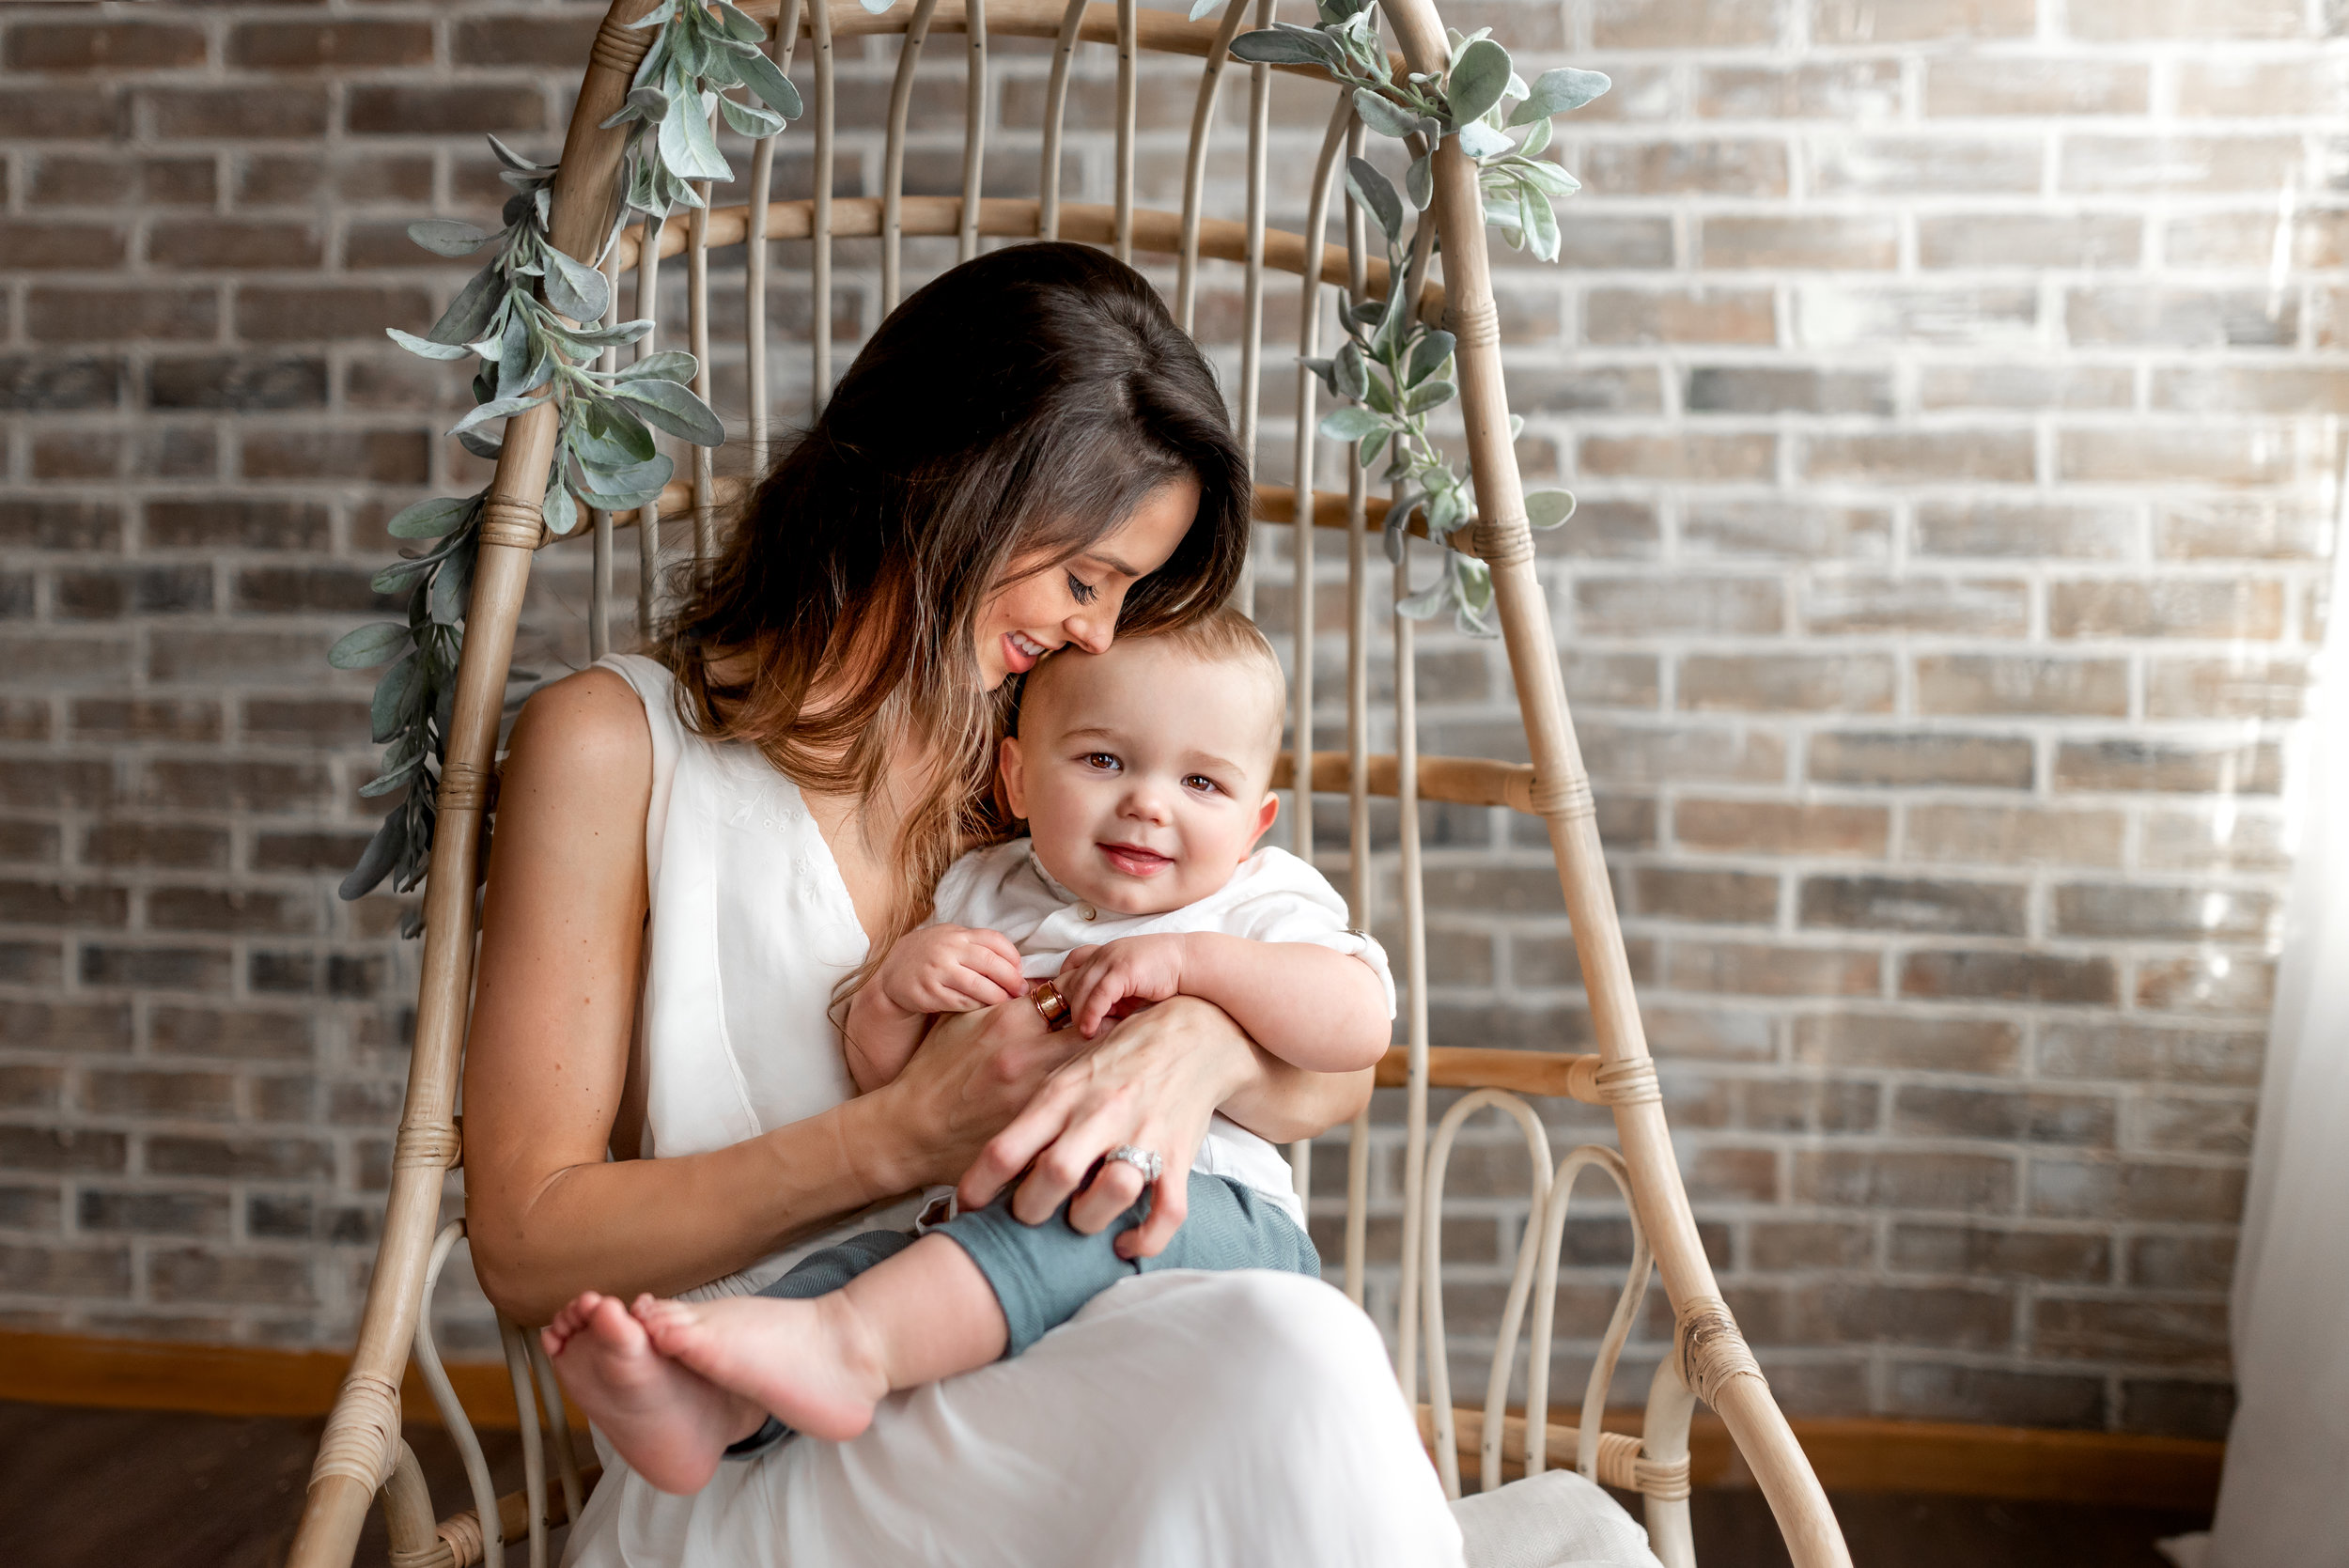 katy-tx-motherhood-photographer-houston-mommy-me-session.jpg